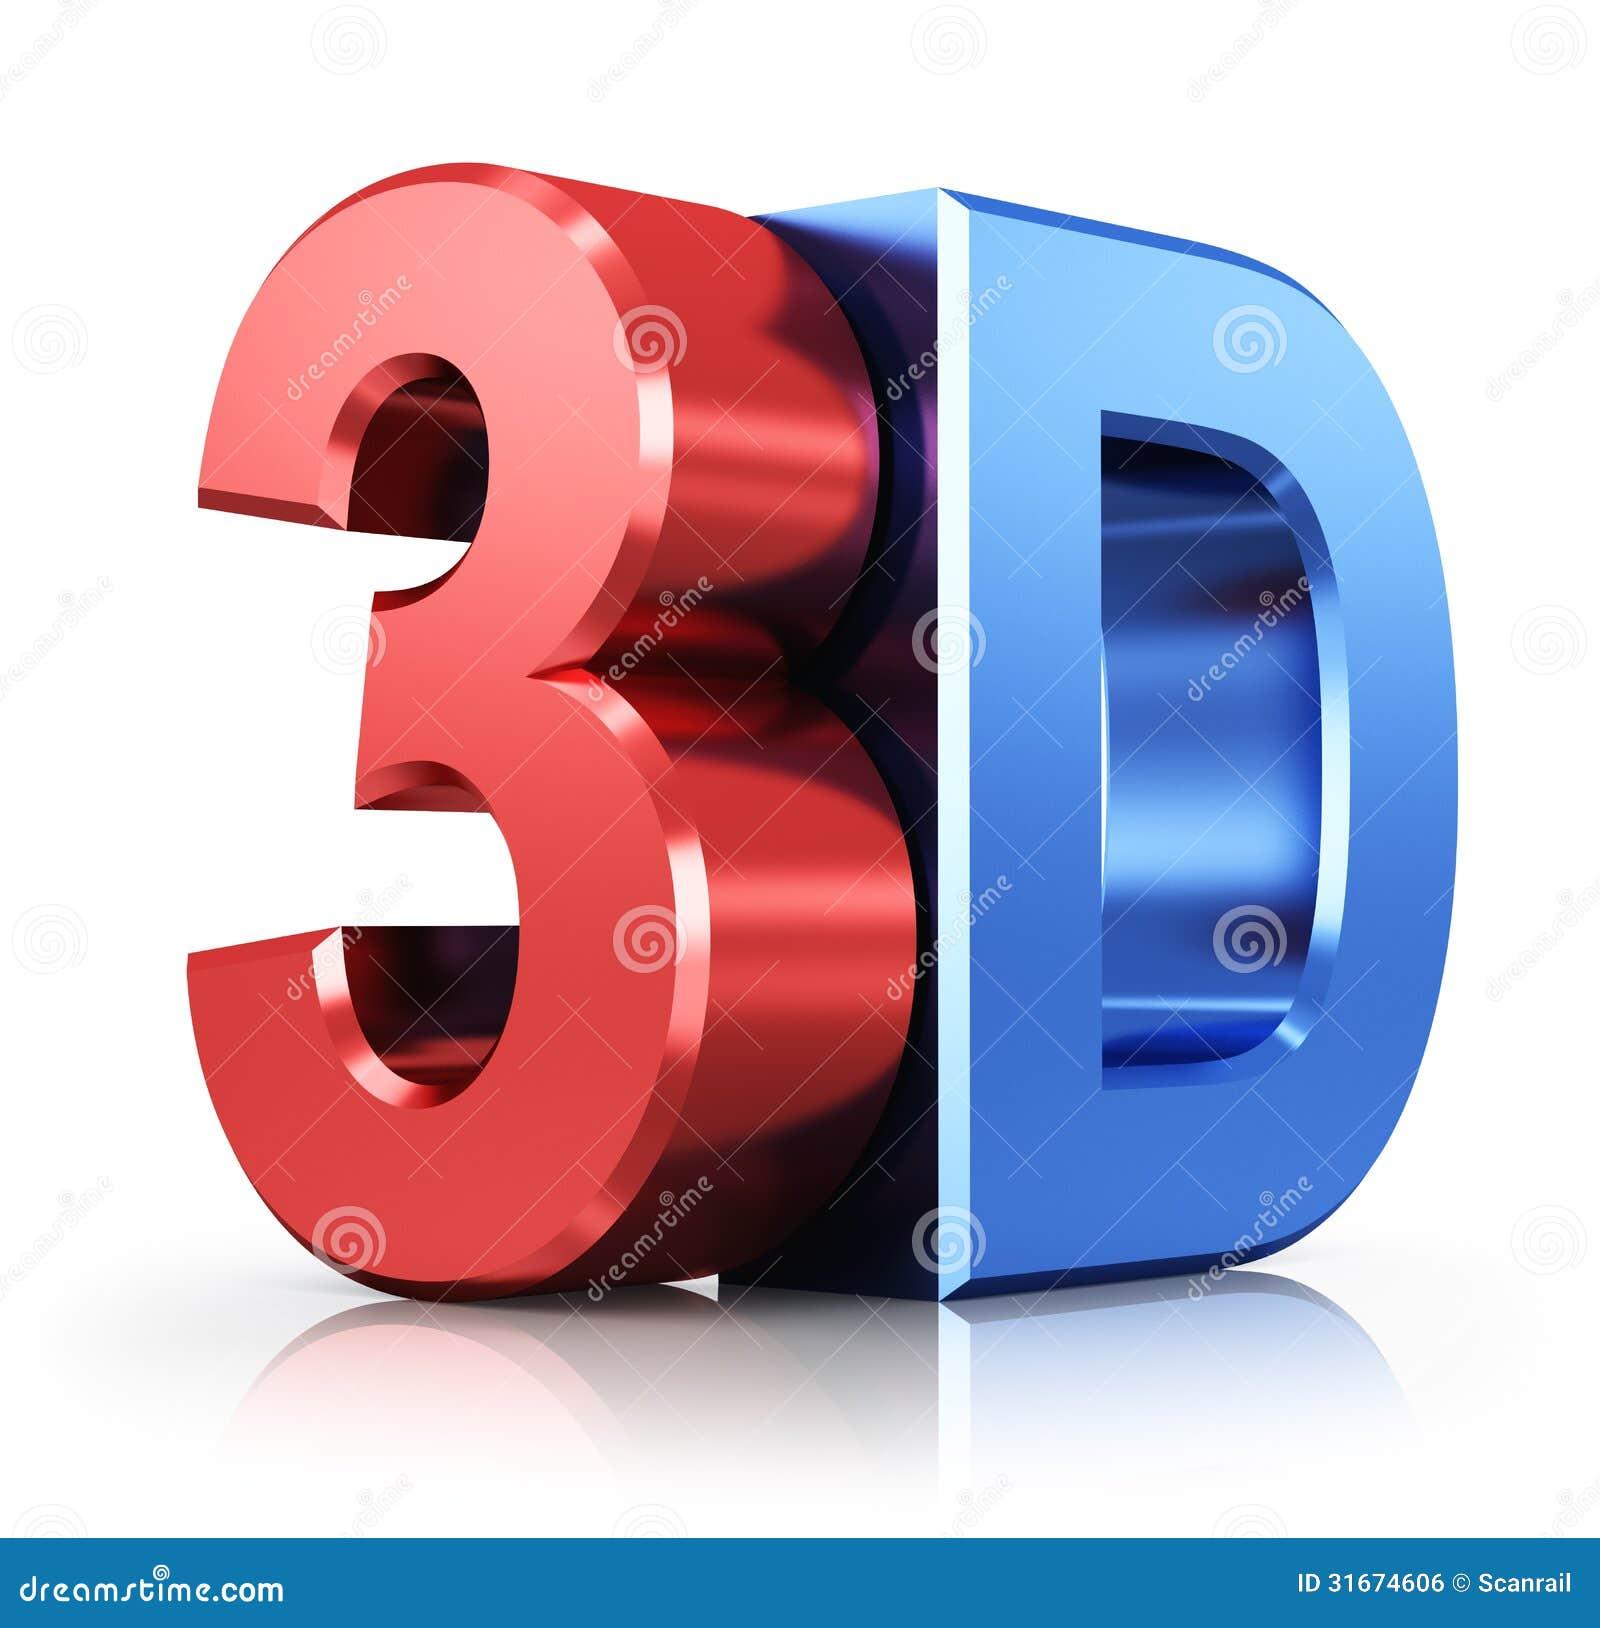 3d logo royalty free stock image image 31674606 Free 3d